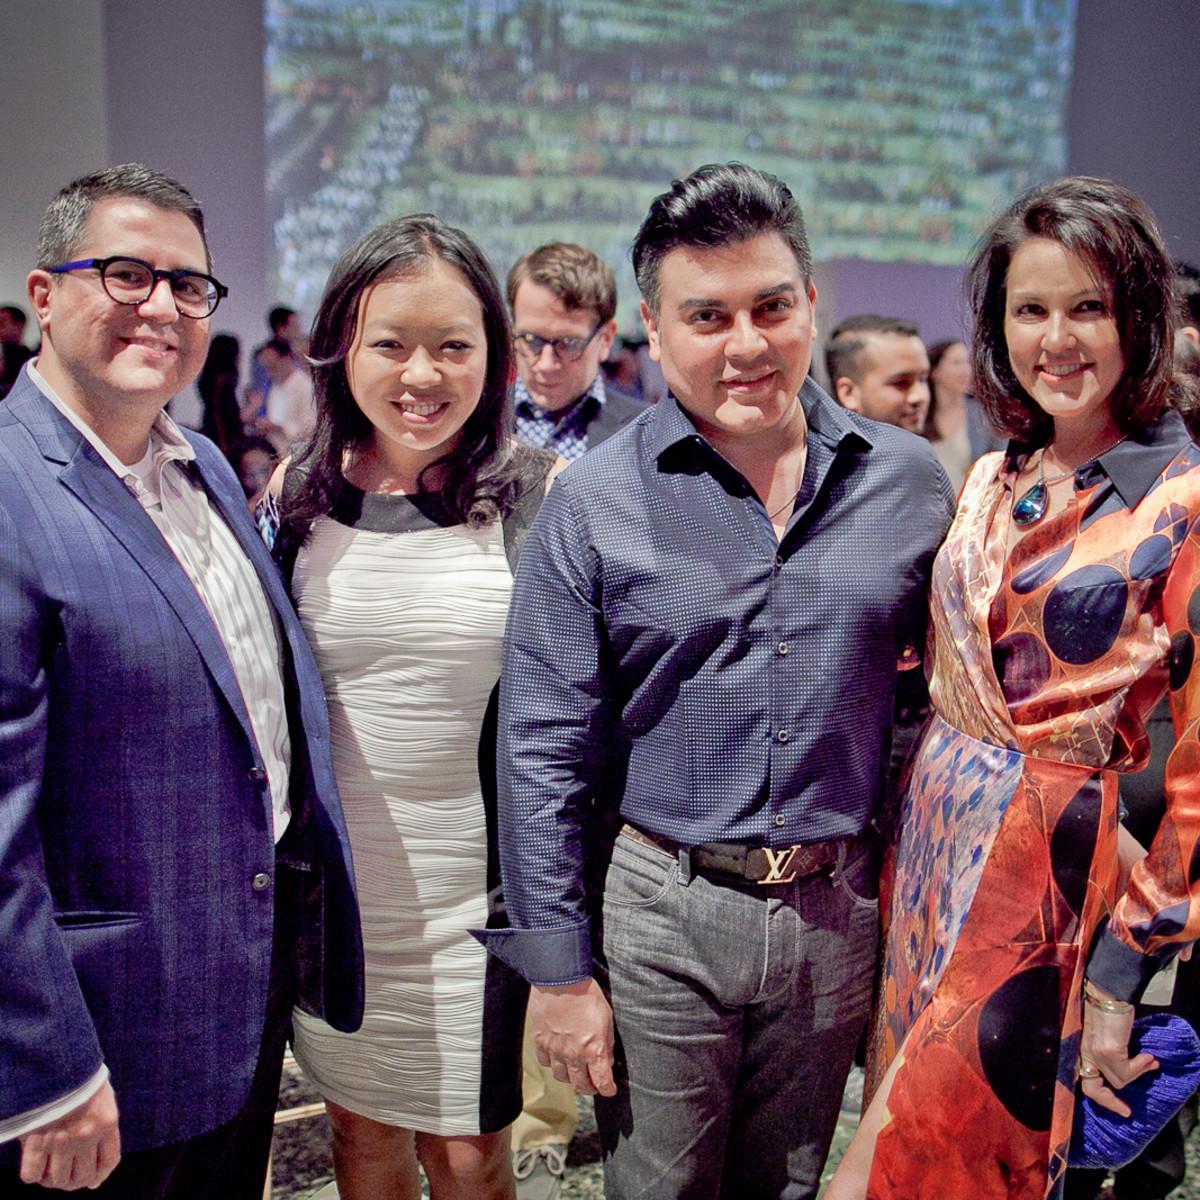 Houston, Fashion Fusion, June 2015, Roland Maldonado, Miya Shay, Edward Sanchez, Jessica Rossman